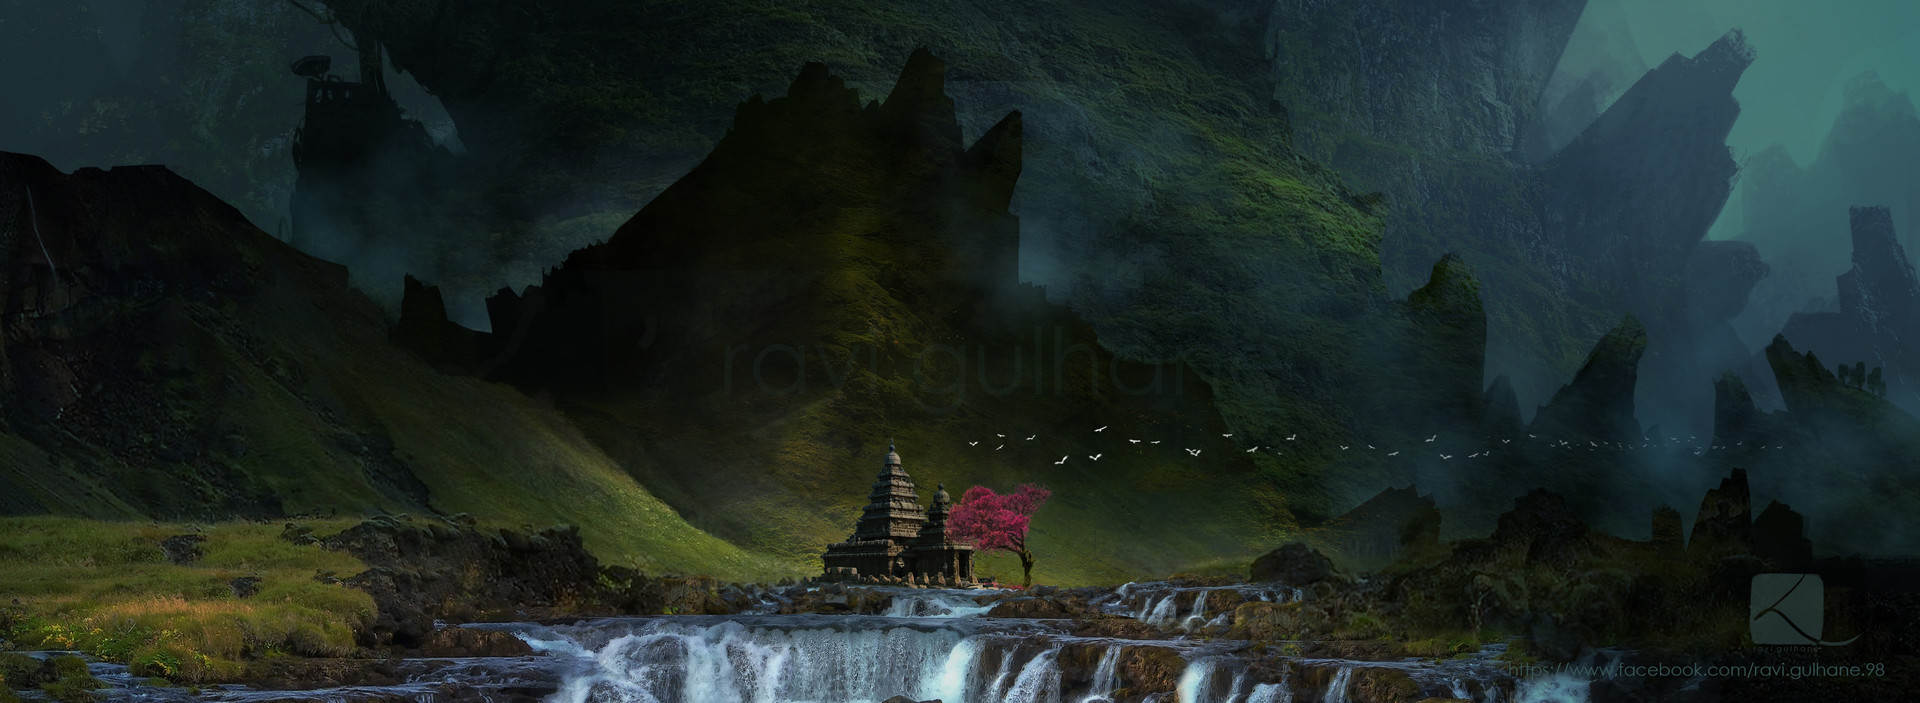 Shiv Shankar Hd Wallpaper Artstation Mysterious Island Ruined Temple Concept Art